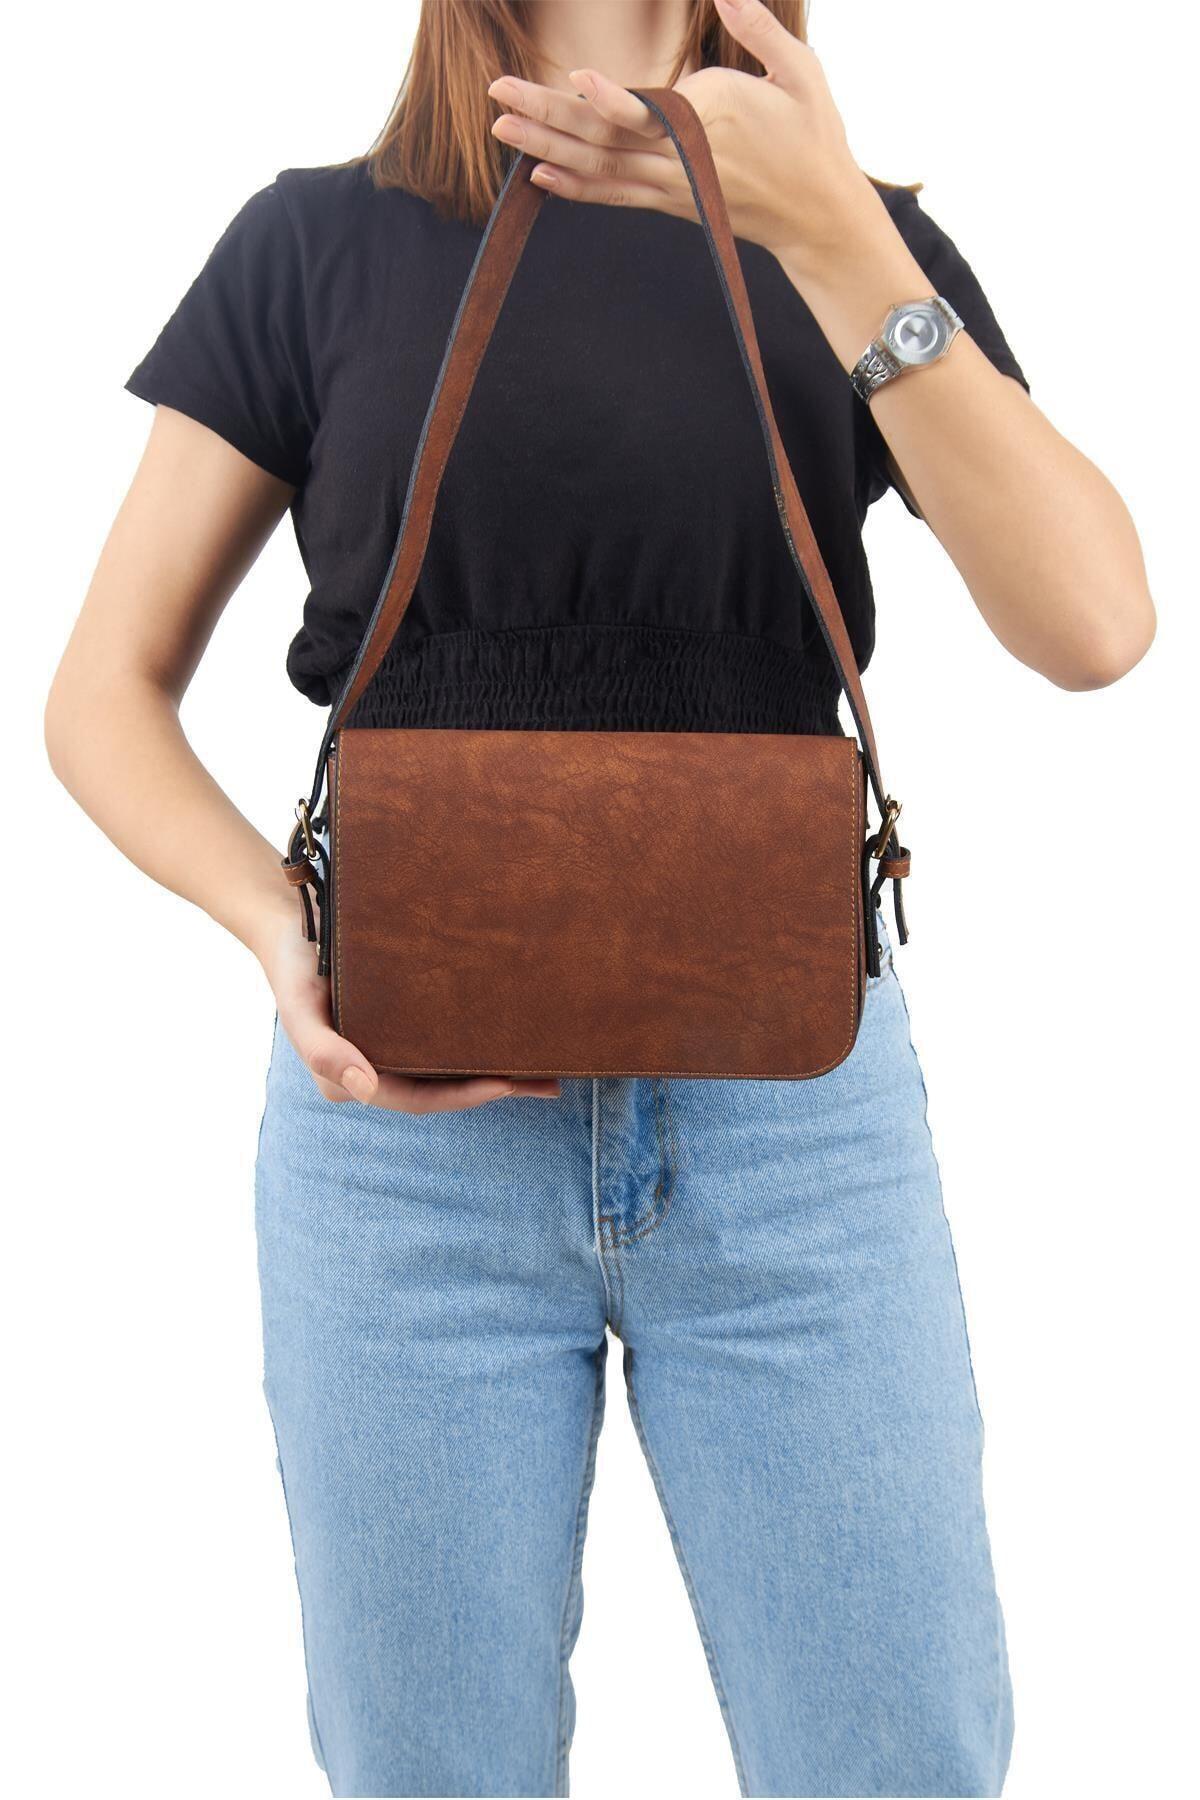 Lebina Kahverengi Kapaklı Baget Çanta 2